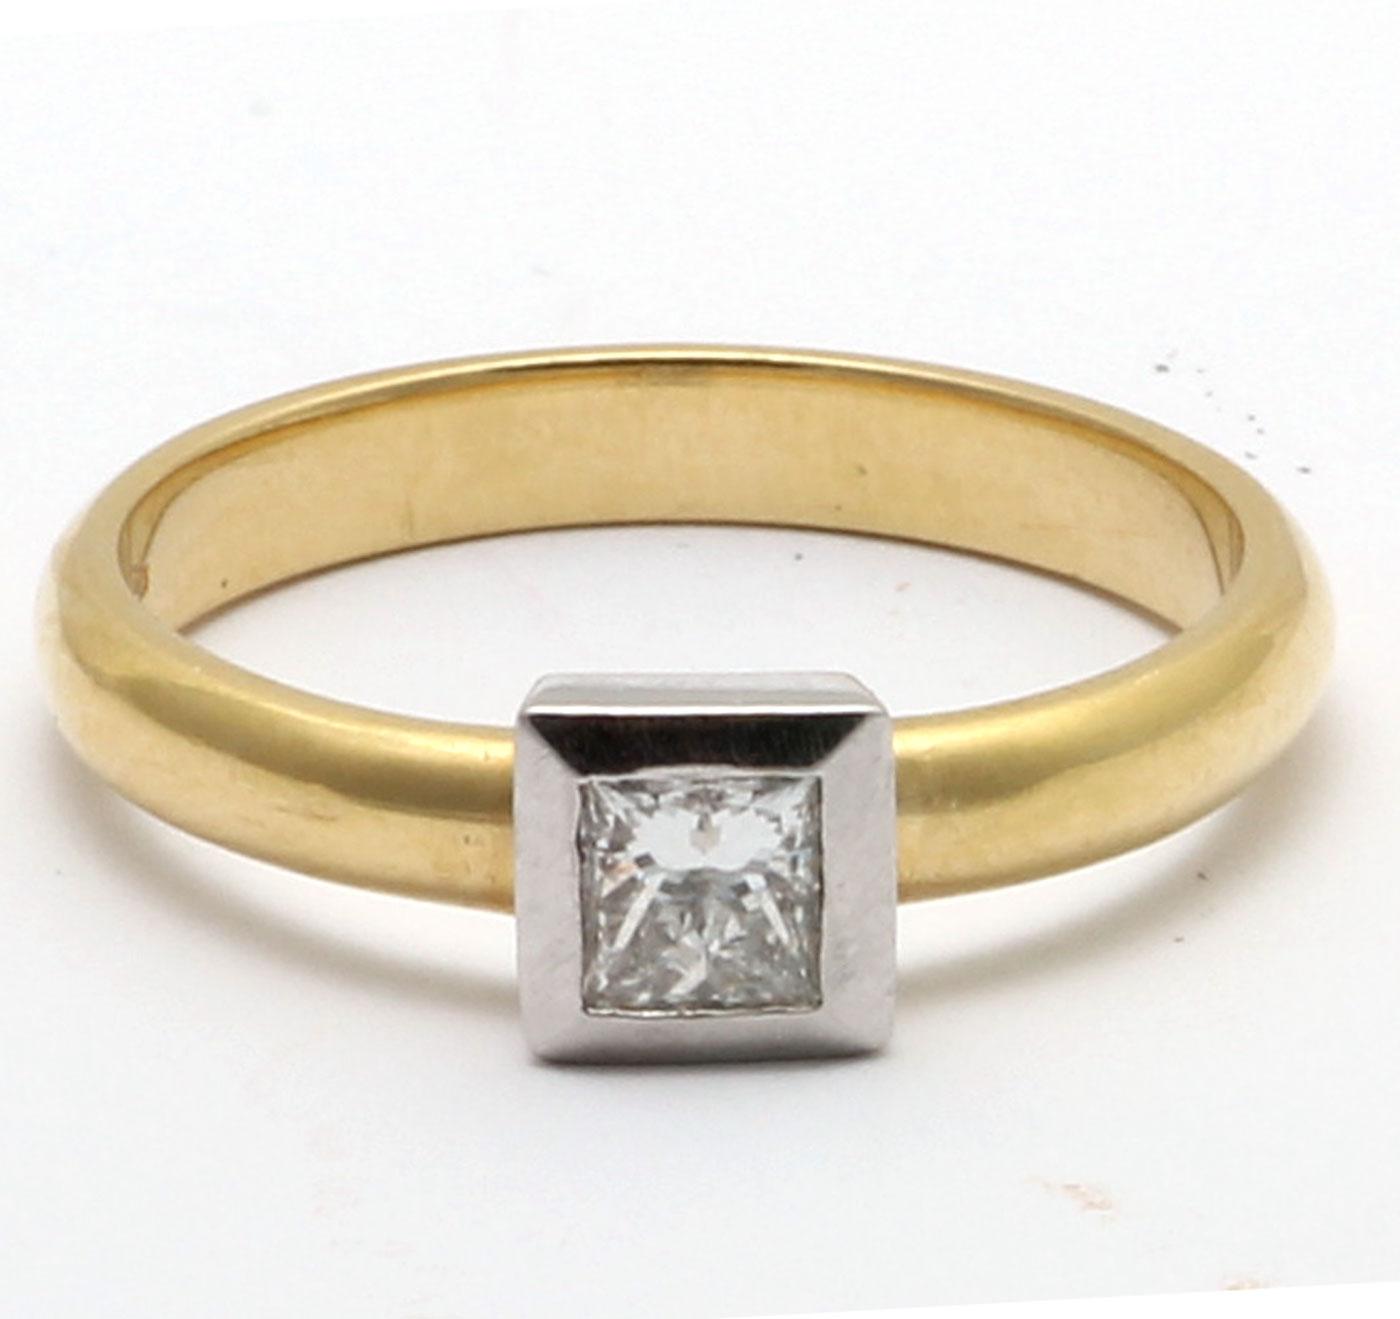 18ct Princess Cut Rub Over Diamond Ring 0.45 Carats - Image 5 of 8